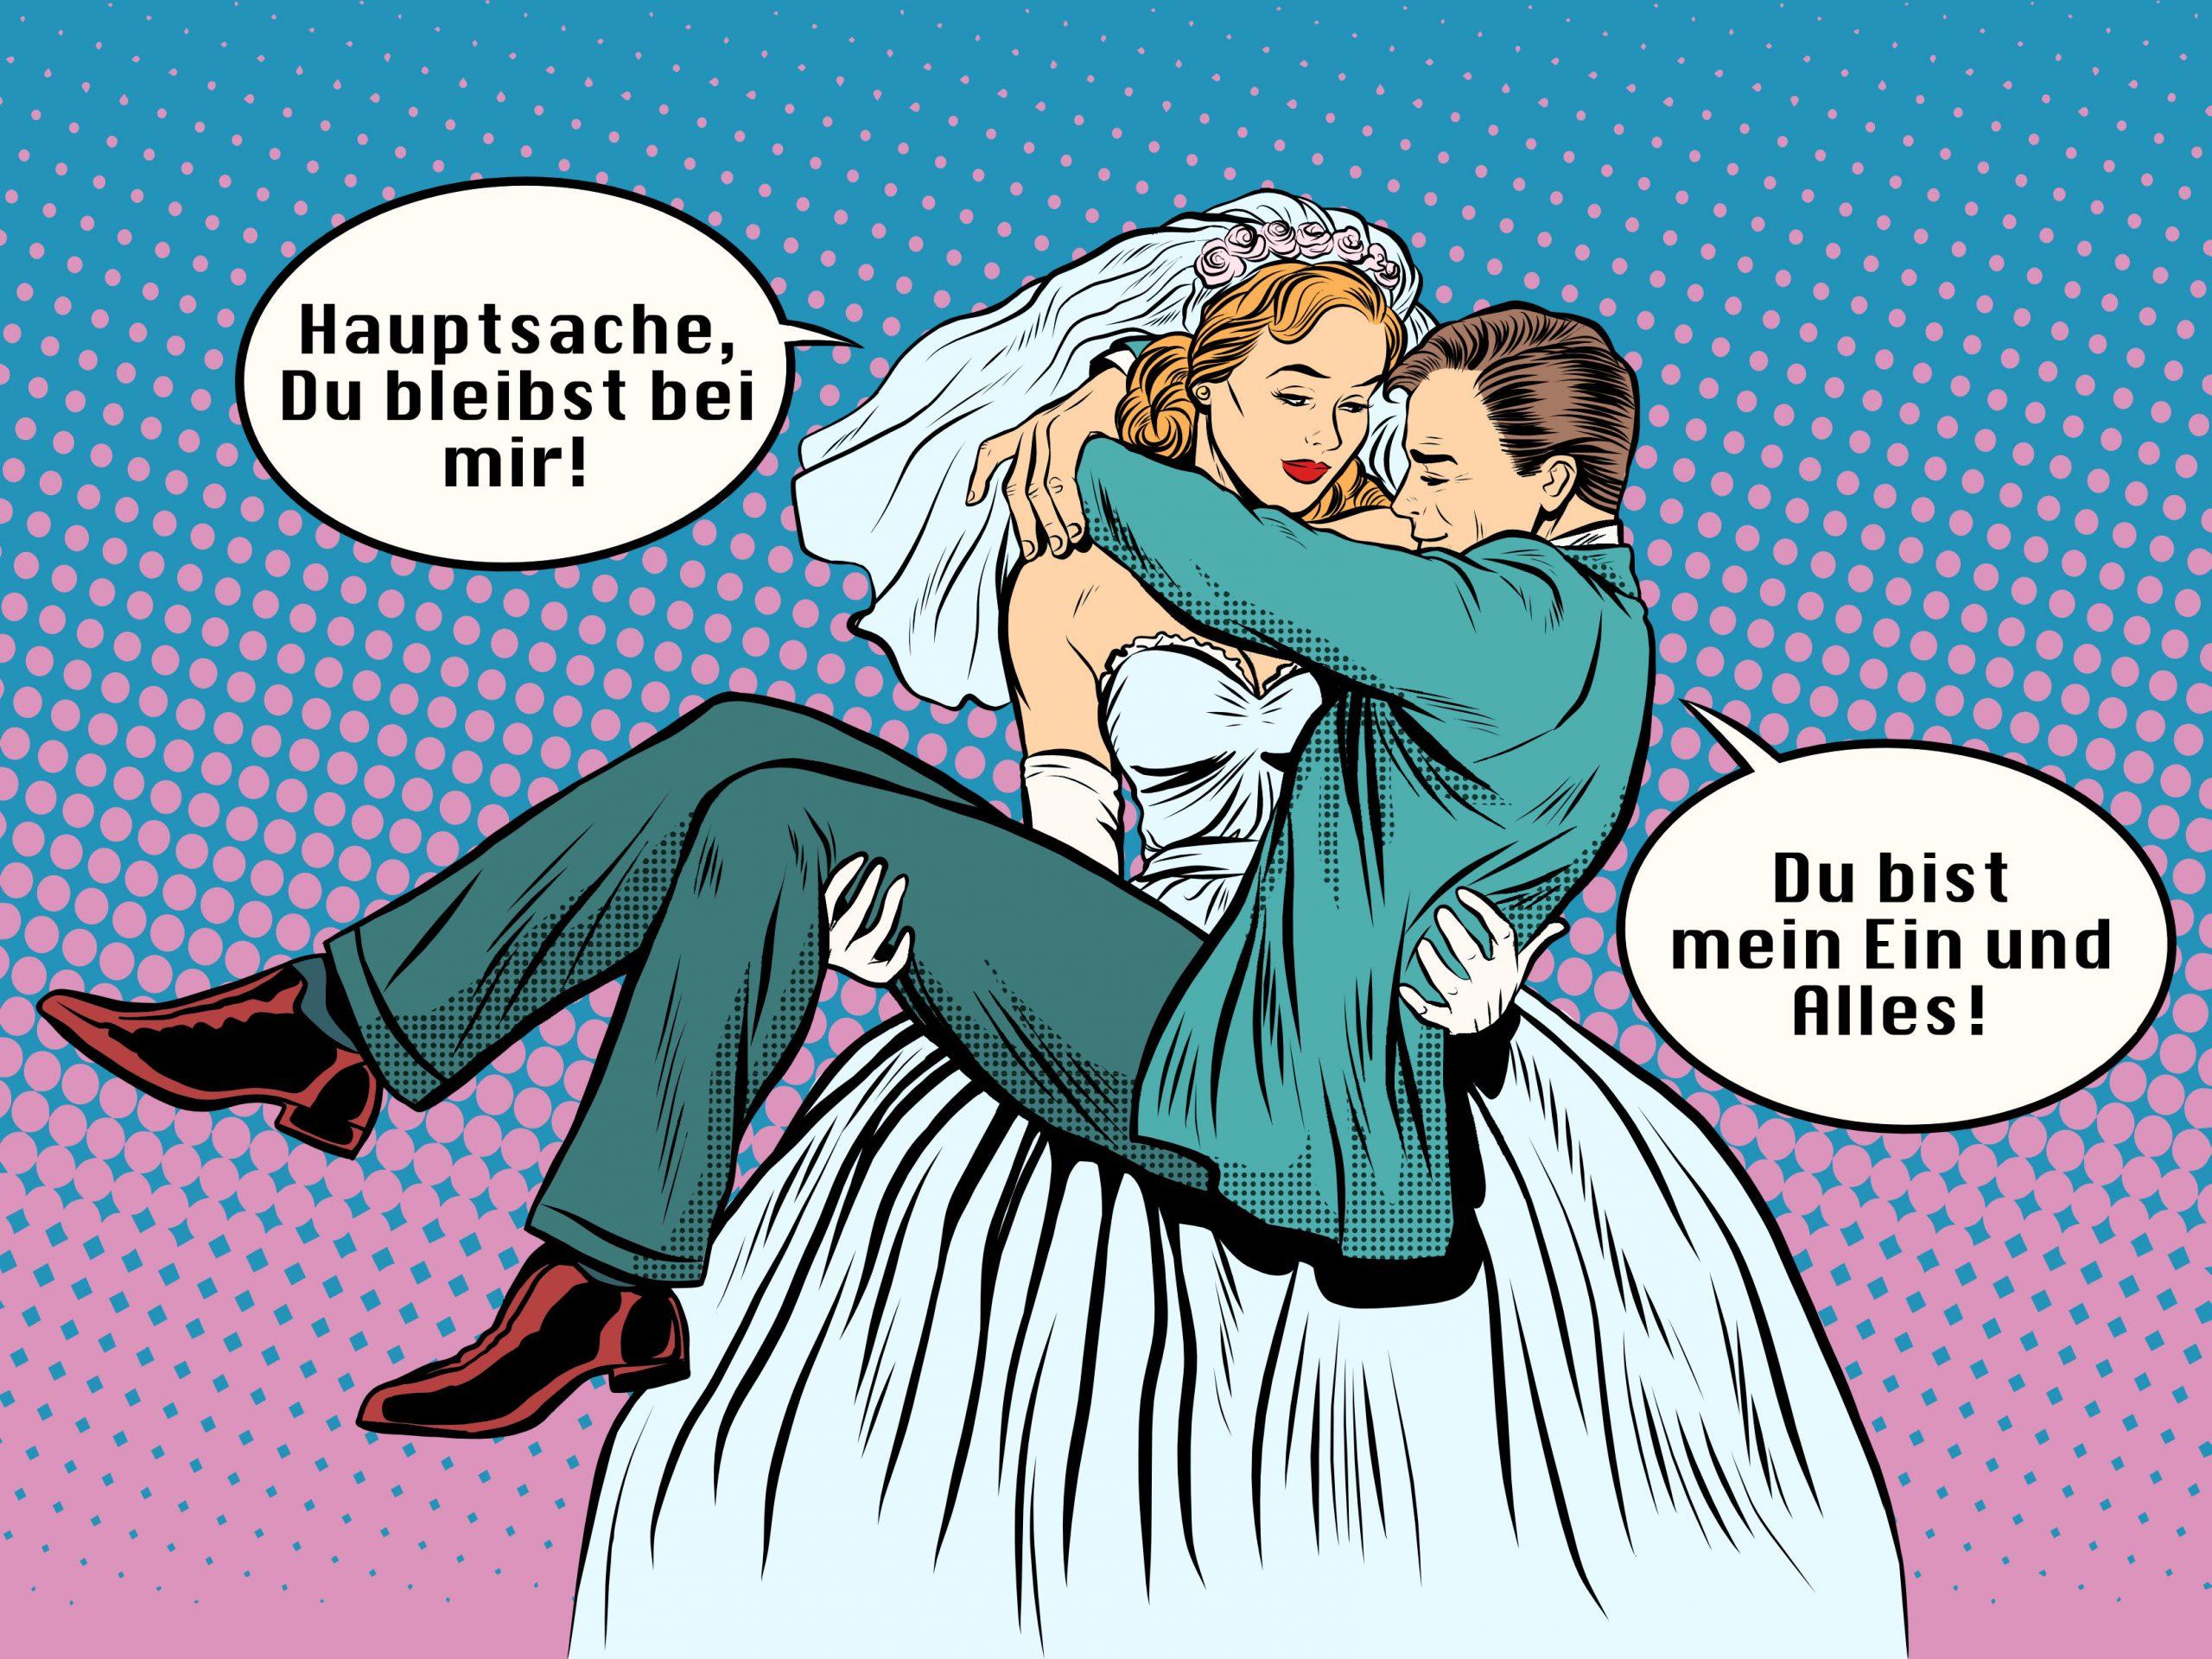 Dauerunglück in Beziehungen (II)